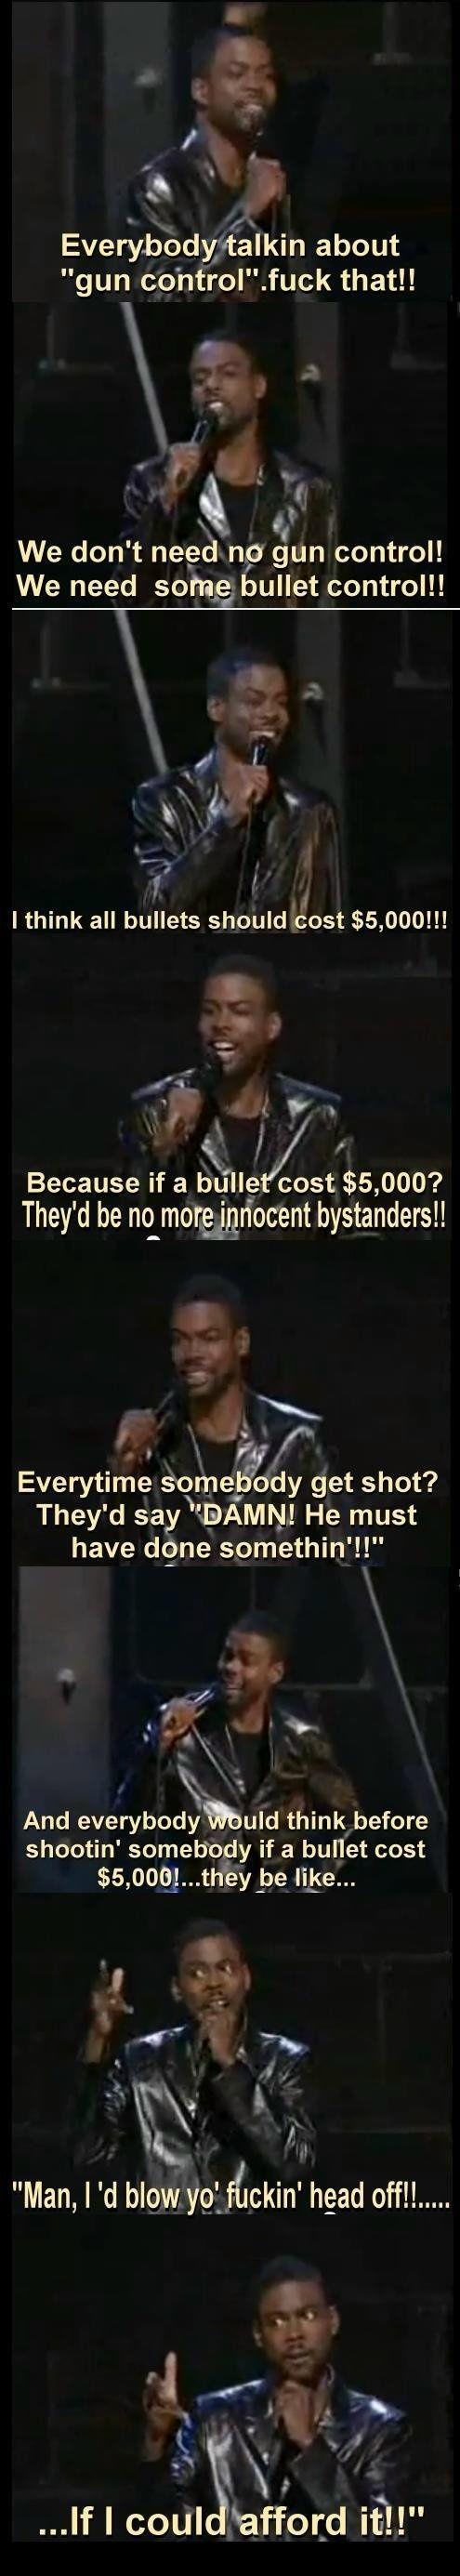 Bullet control. Haha! This is genius.